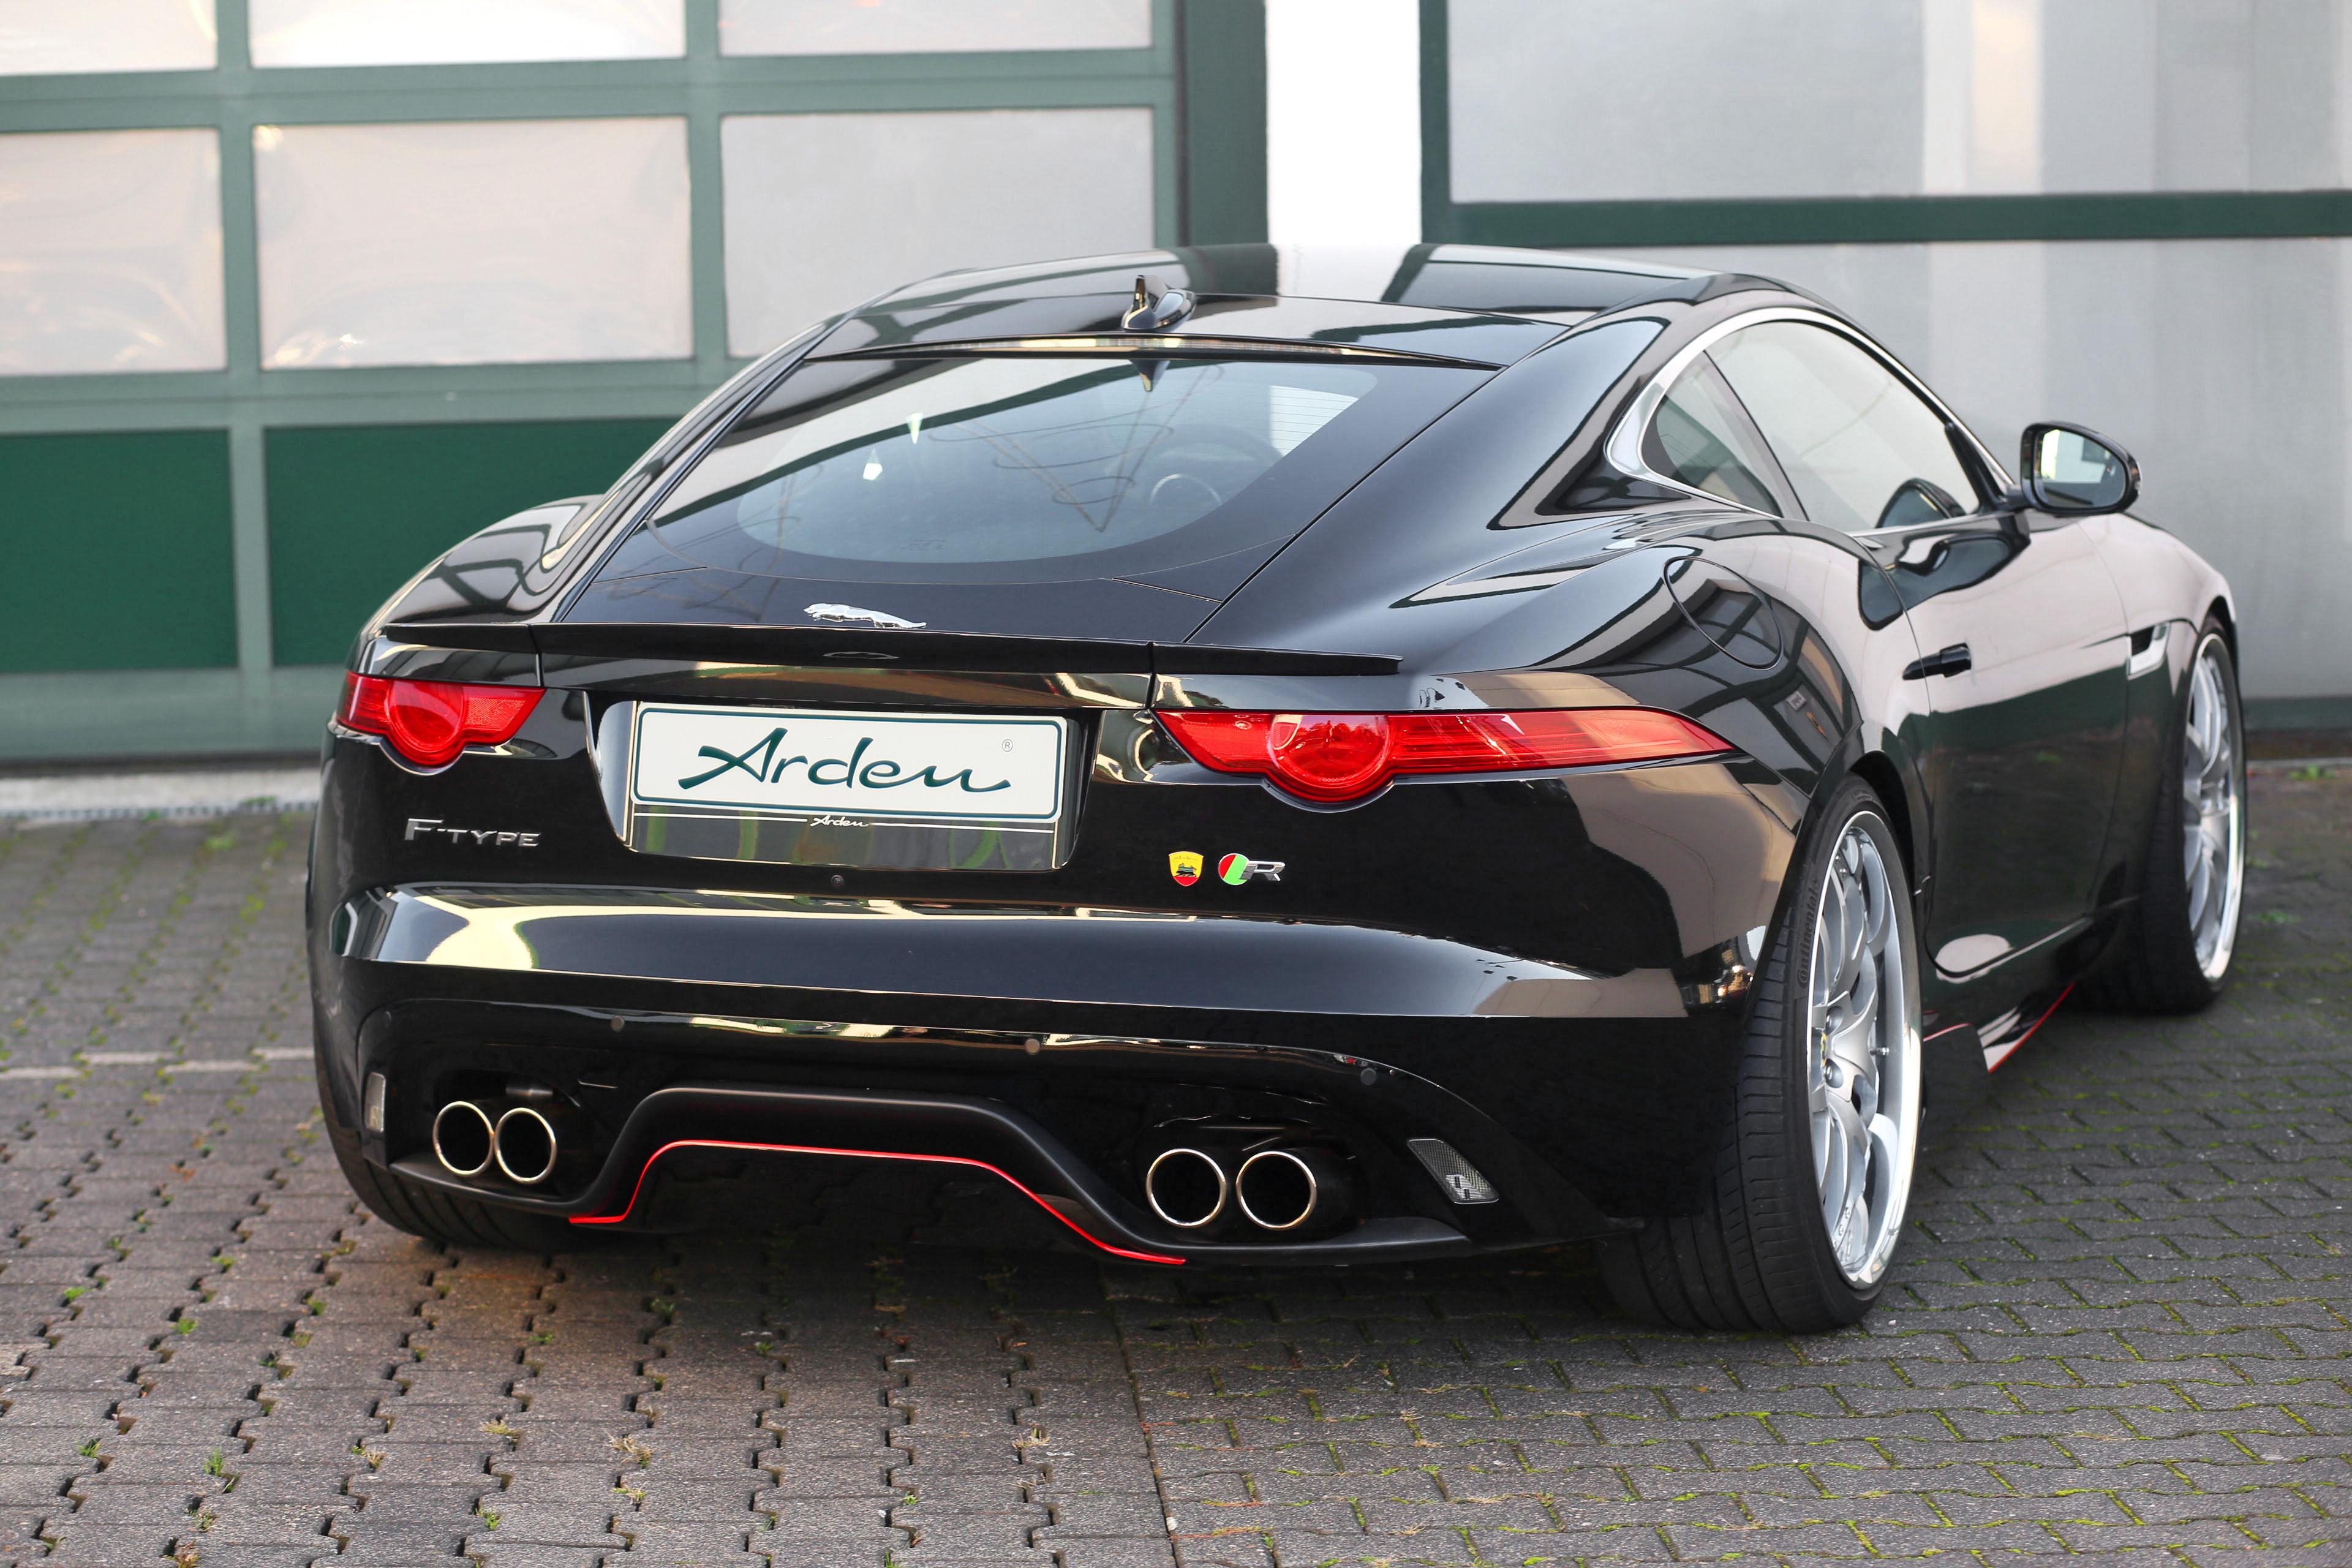 Arden Heckspoiler für Jaguar F-Type Coupe